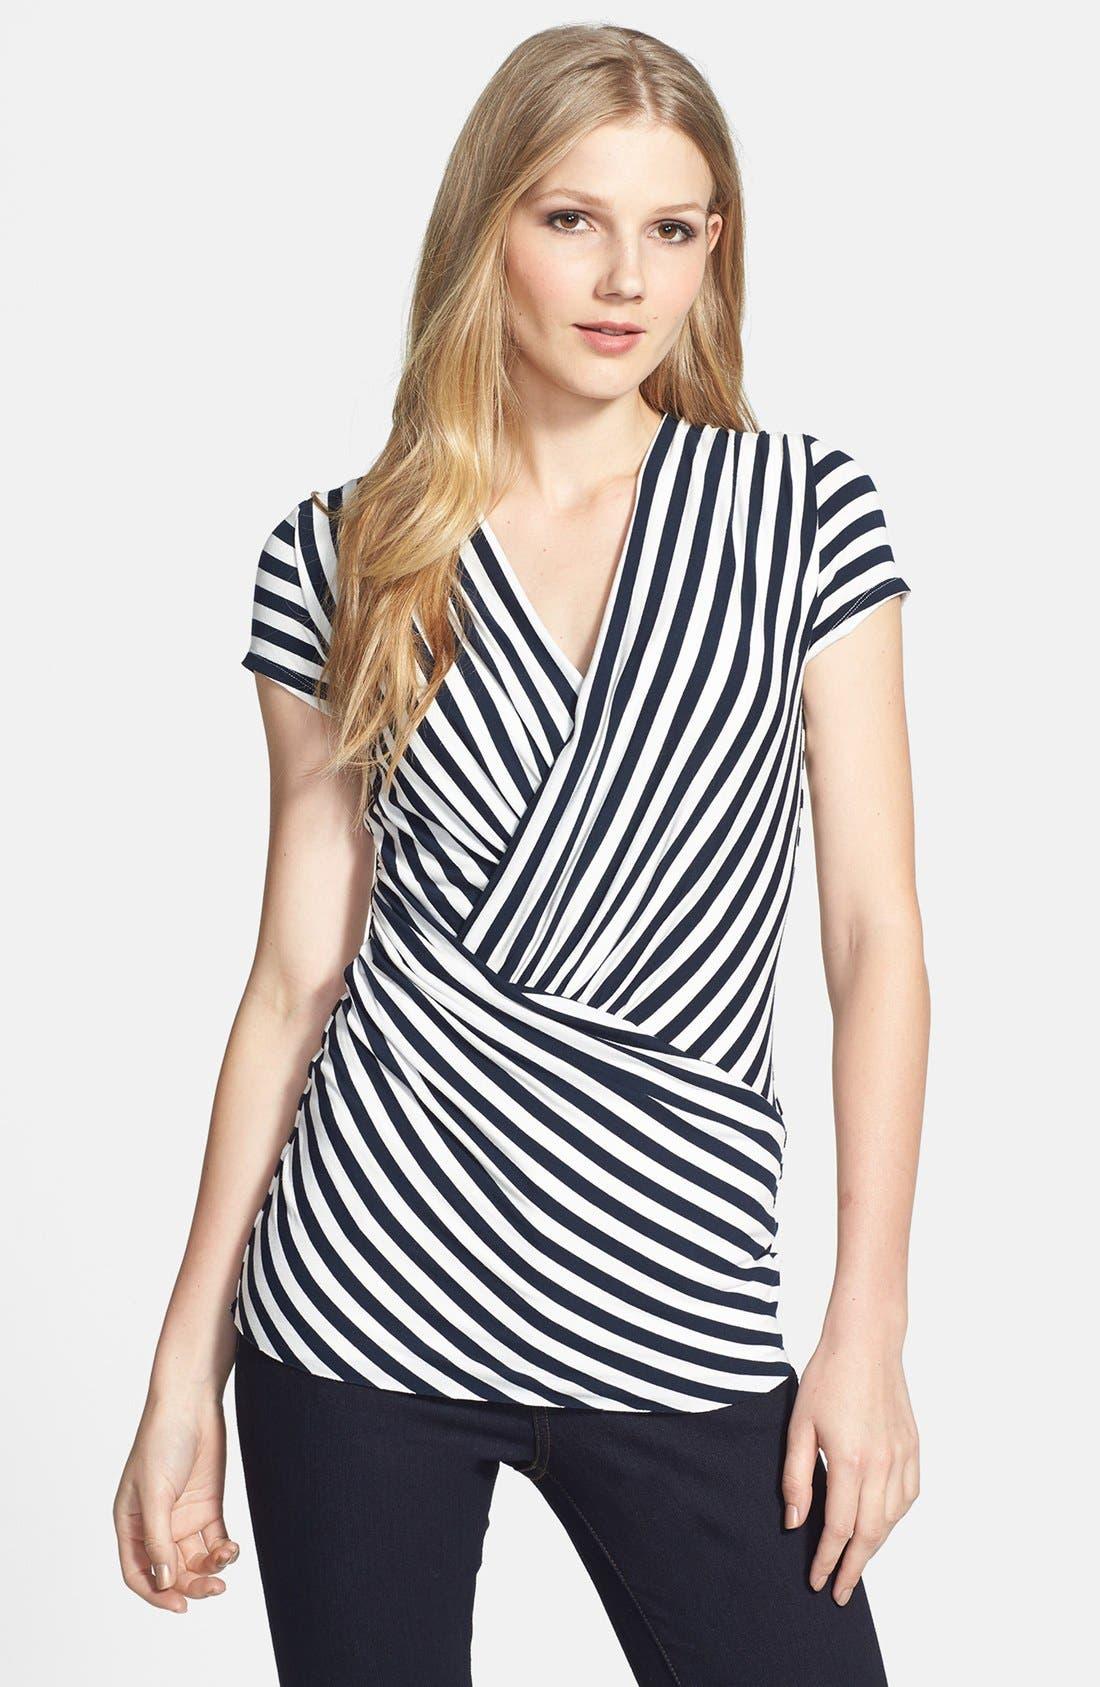 Main Image - Vince Camuto 'Marina Stripe' Asymmetrical Top (Regular & Petite)